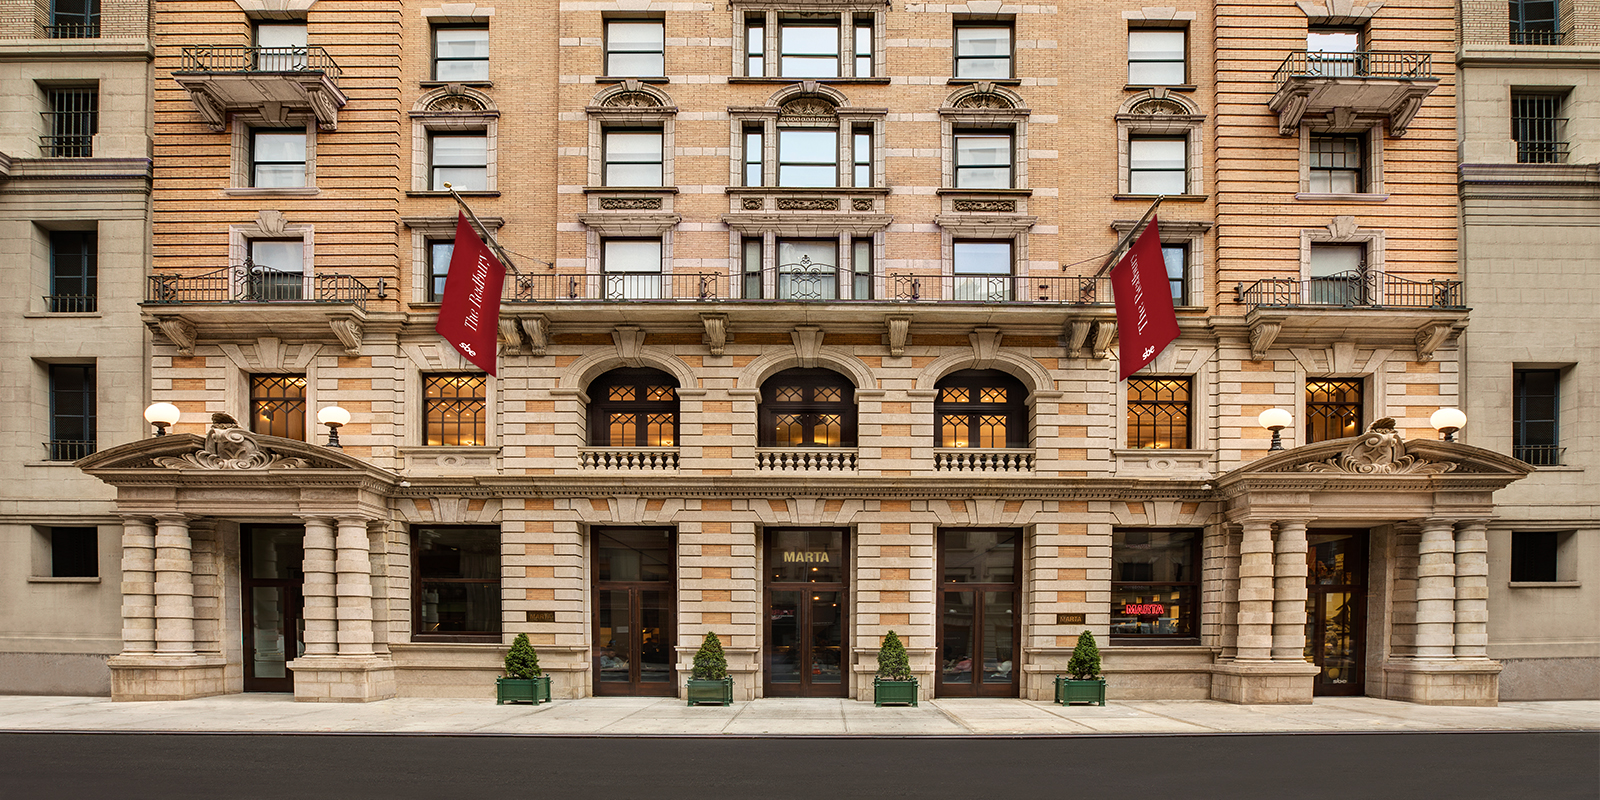 2 Bedroom Suites In New York City Midtown Nyc Hotel Rooms Amp Suites The Redbury New York